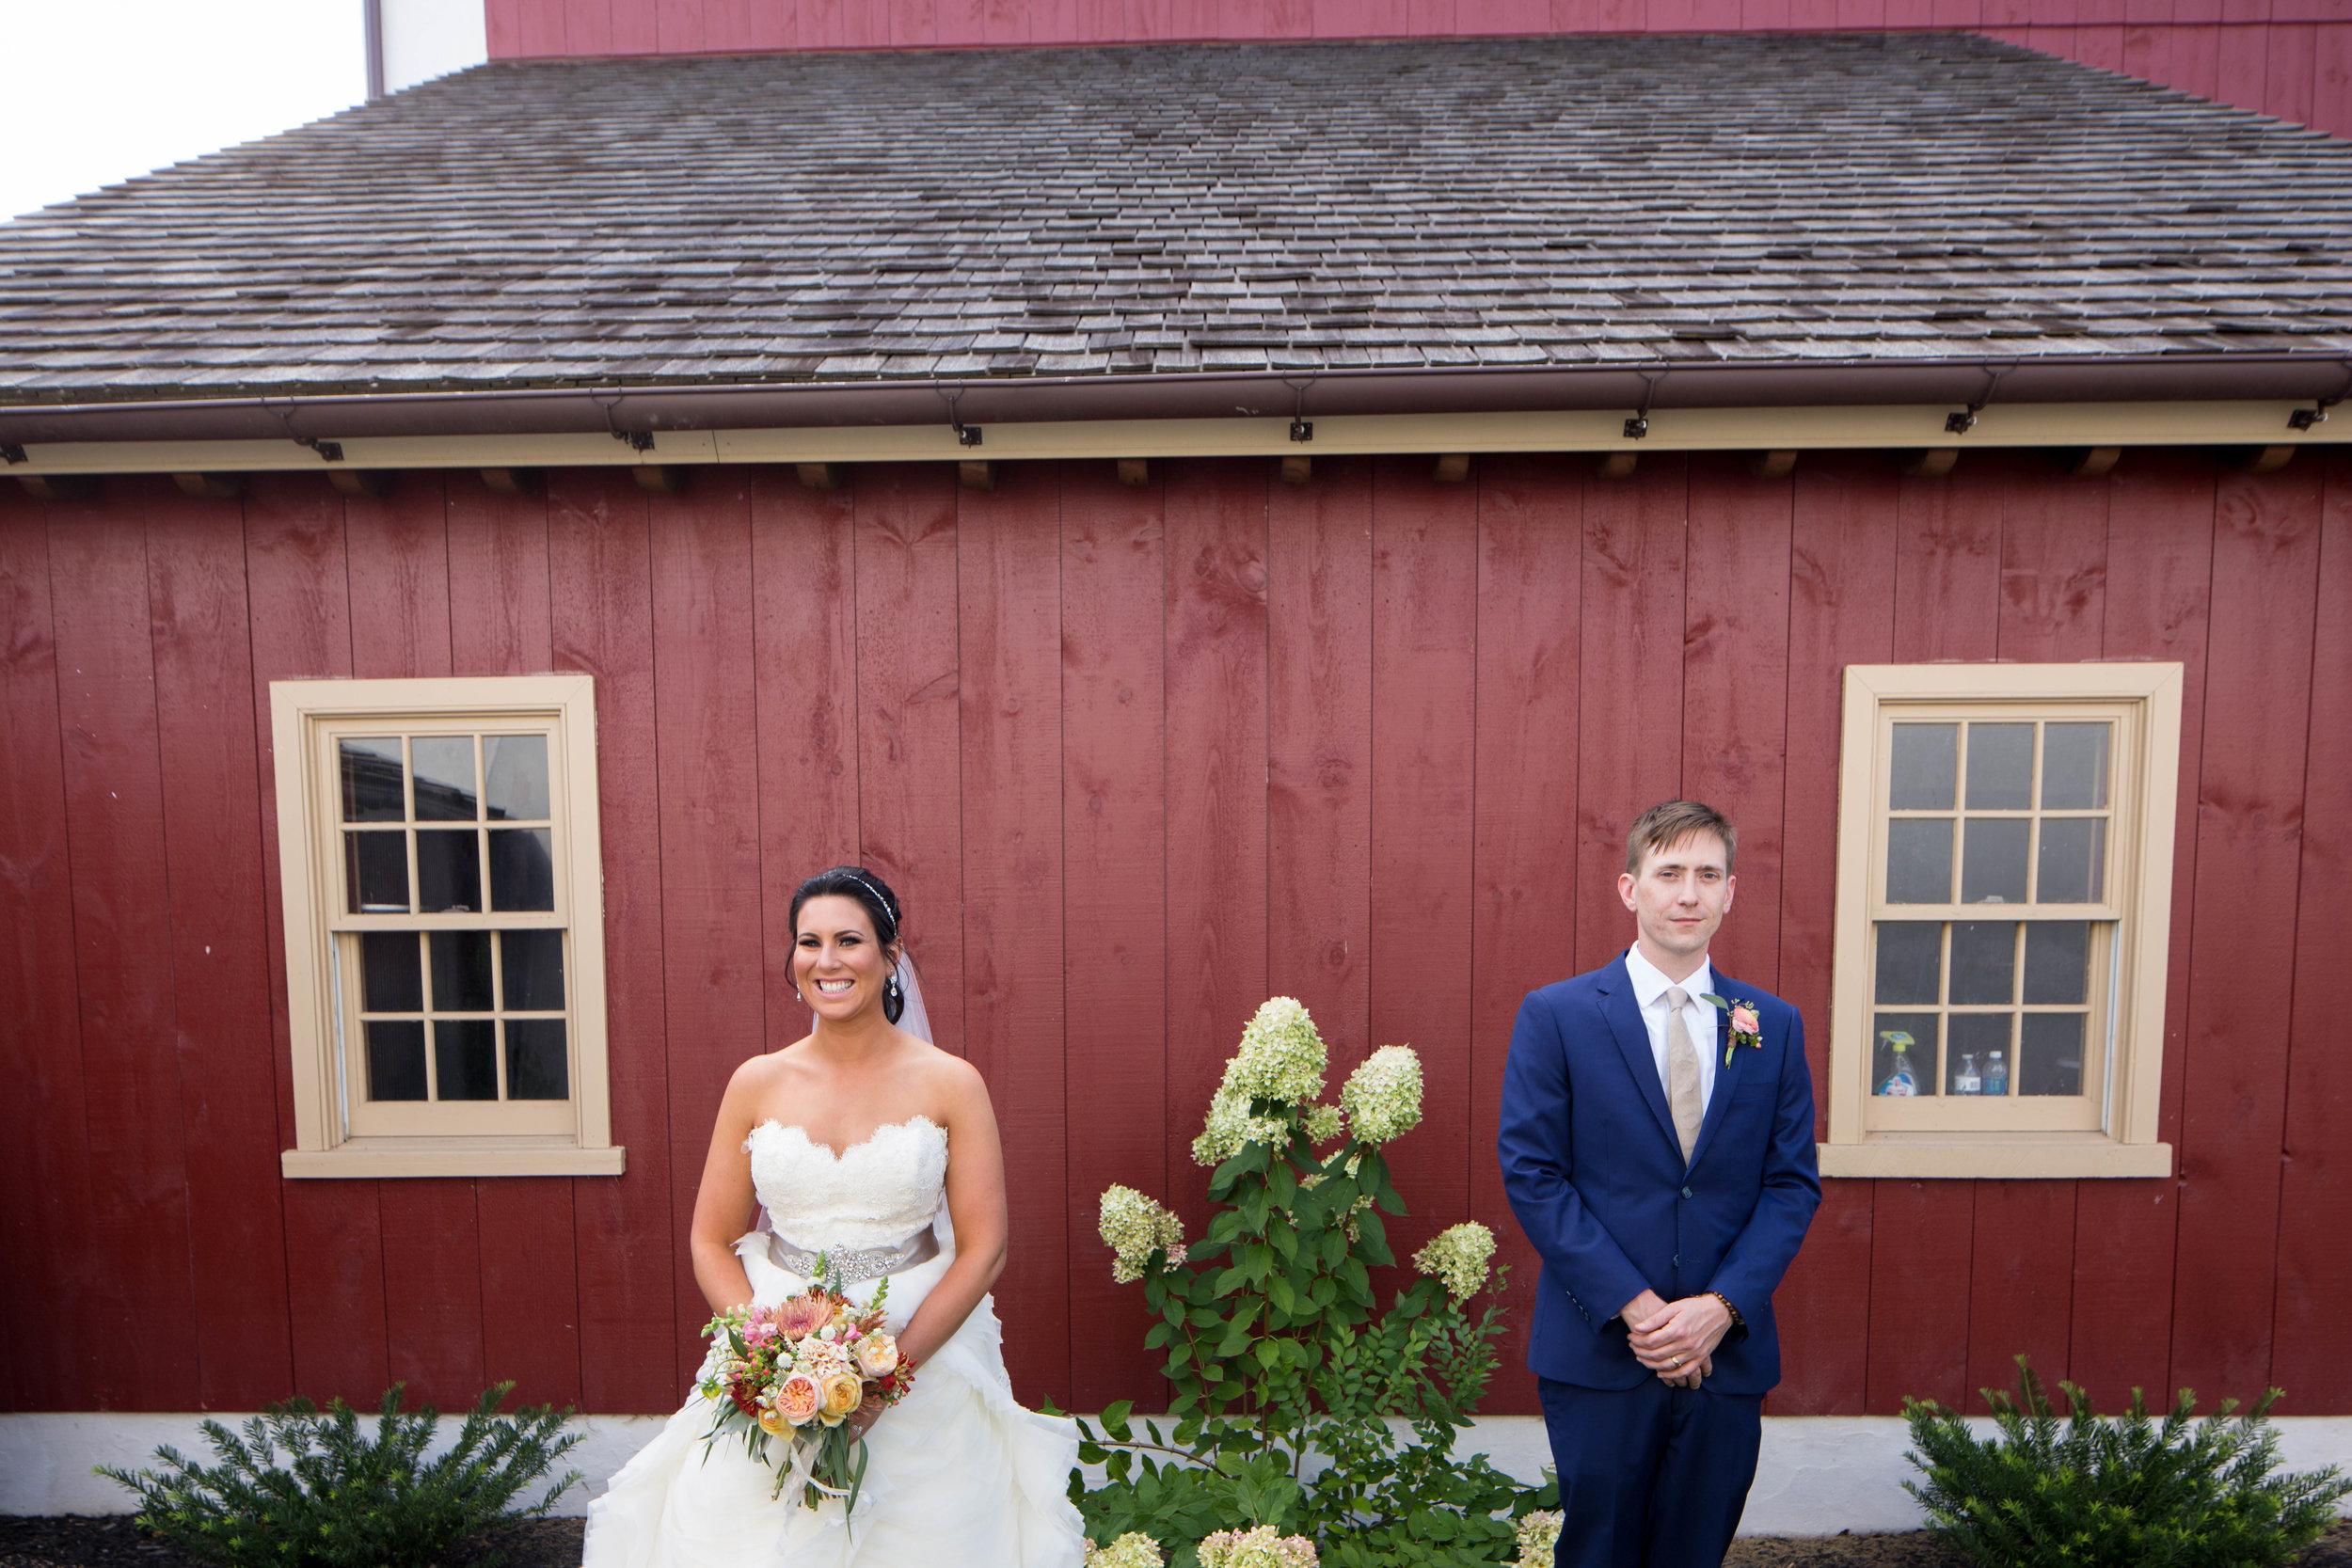 Philadelphia-Wedding-Planner-Heart-And-Dash-NicoleConnor-DrewNoelPhotography-1850.jpg